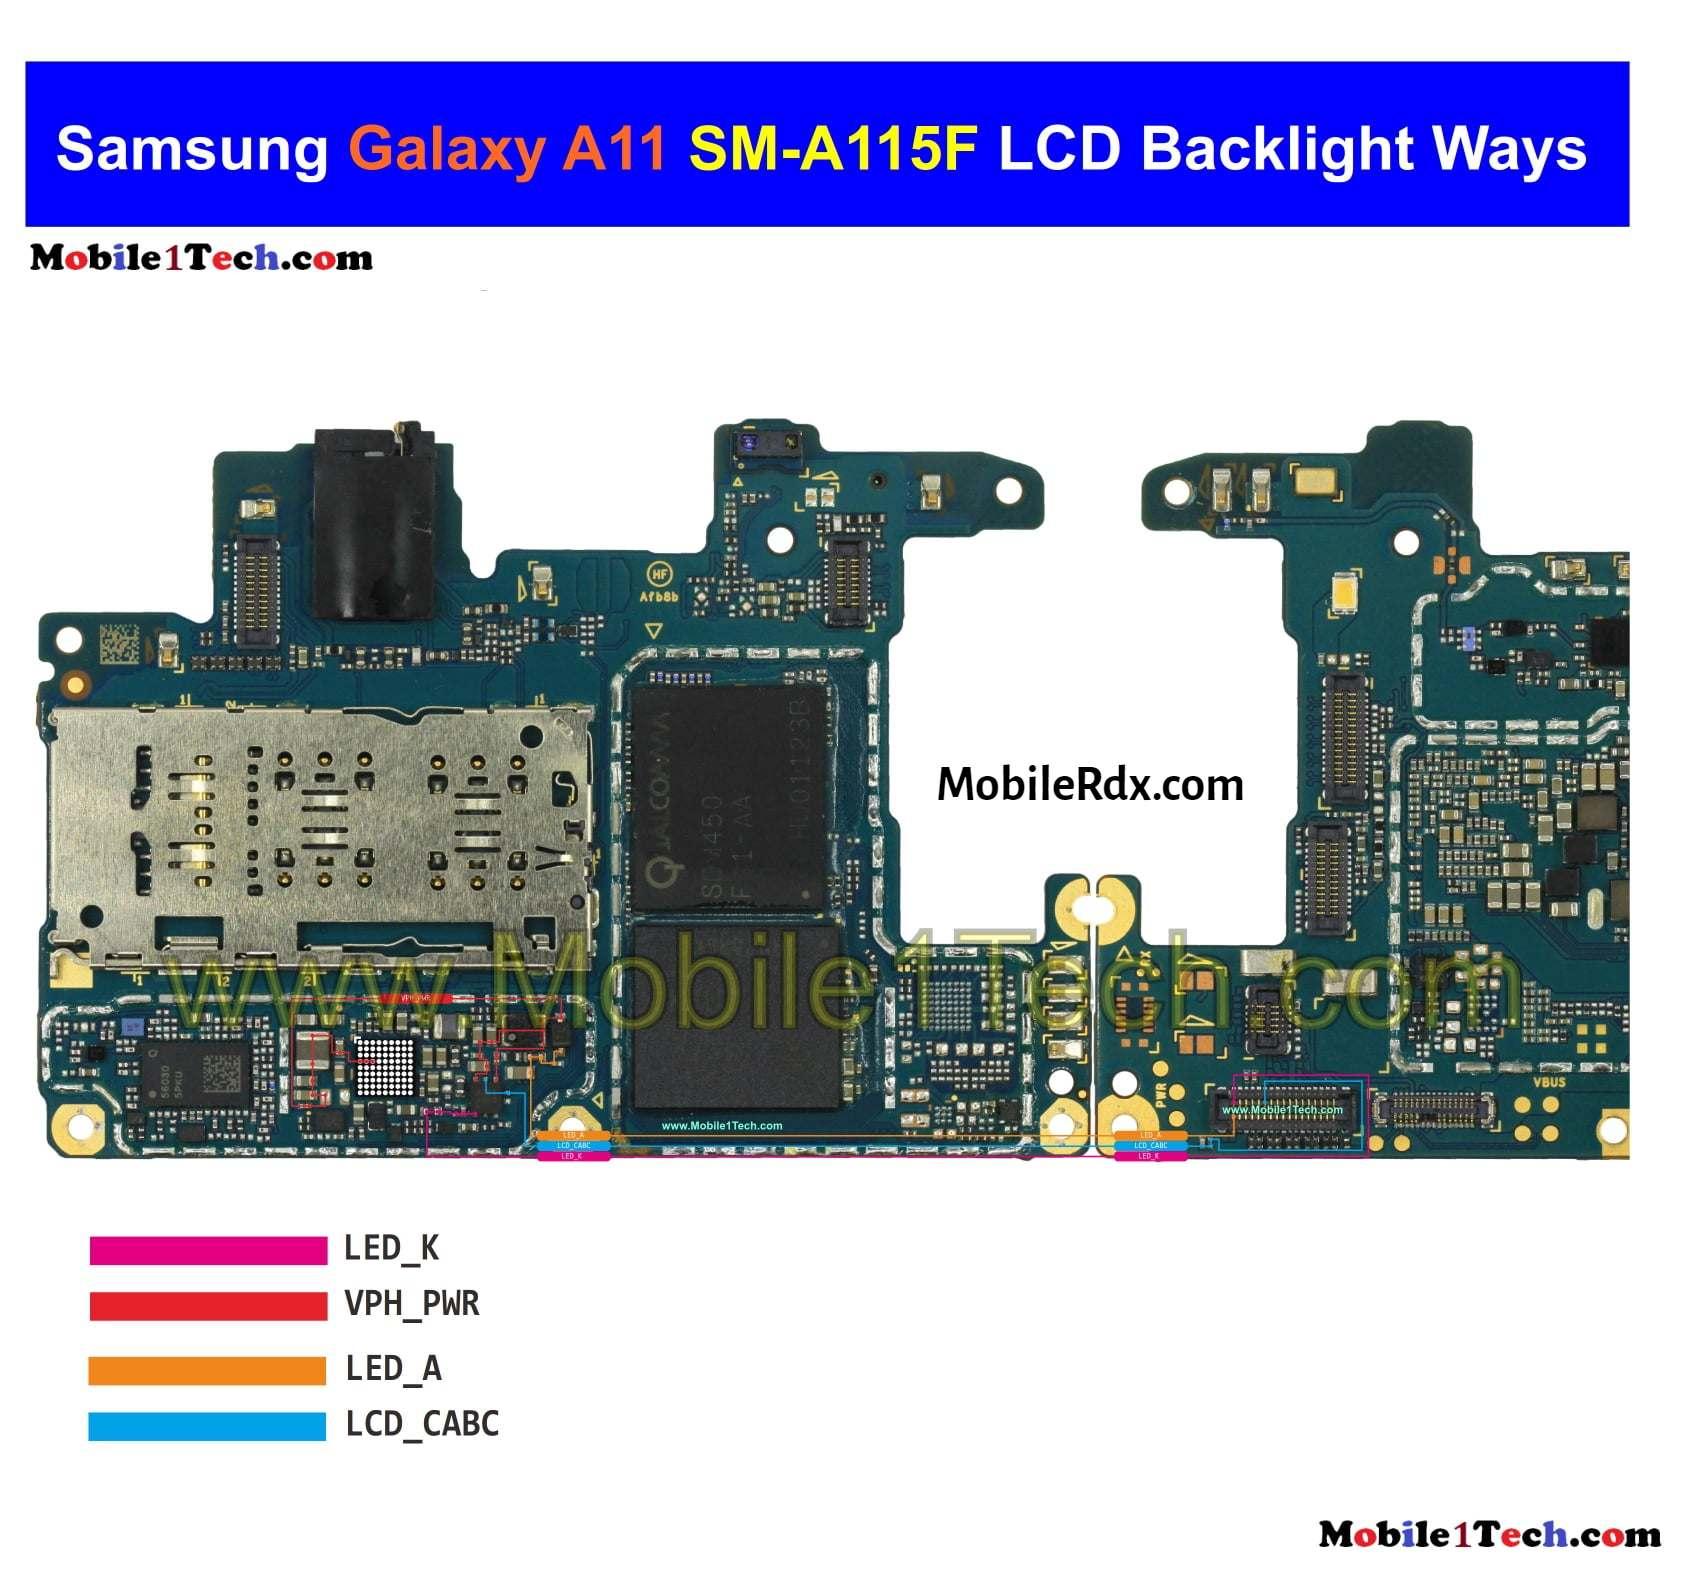 Samsung Galaxy A11 A115F Backlight Ways Repair Display Light Problem